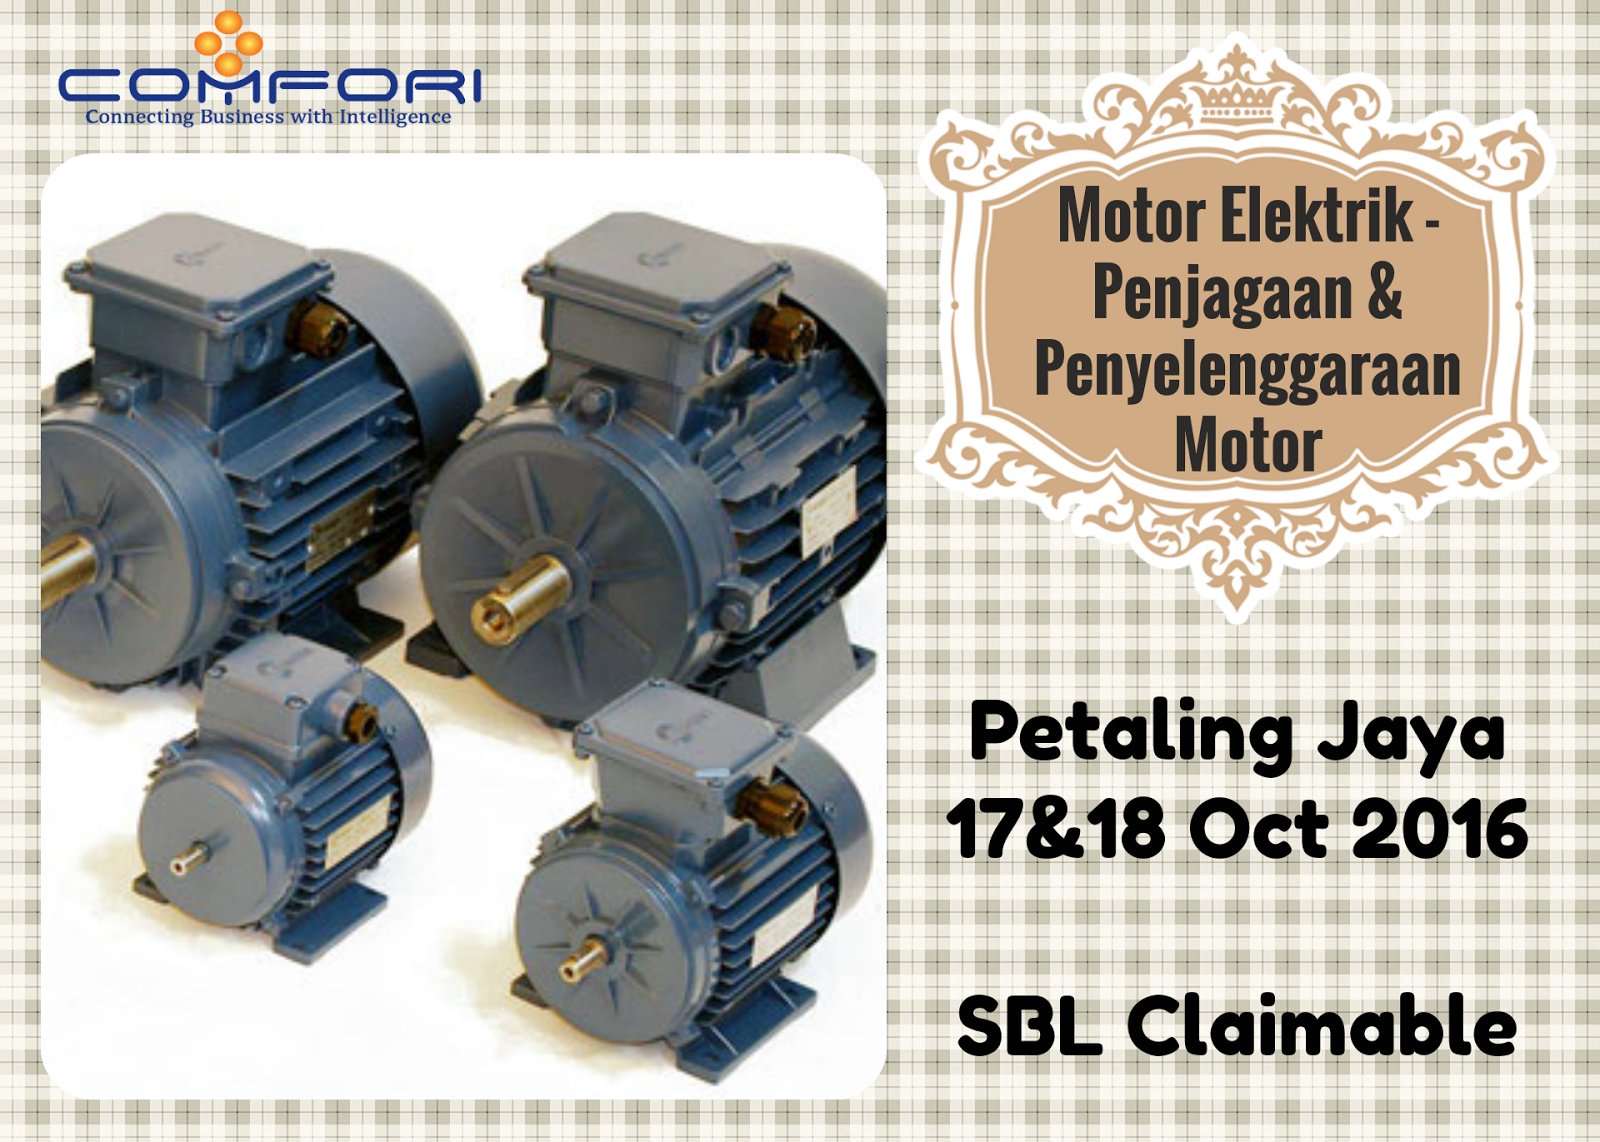 Motor Elektrik - Penjagaan & Penyelenggaraan Motor - Comfori